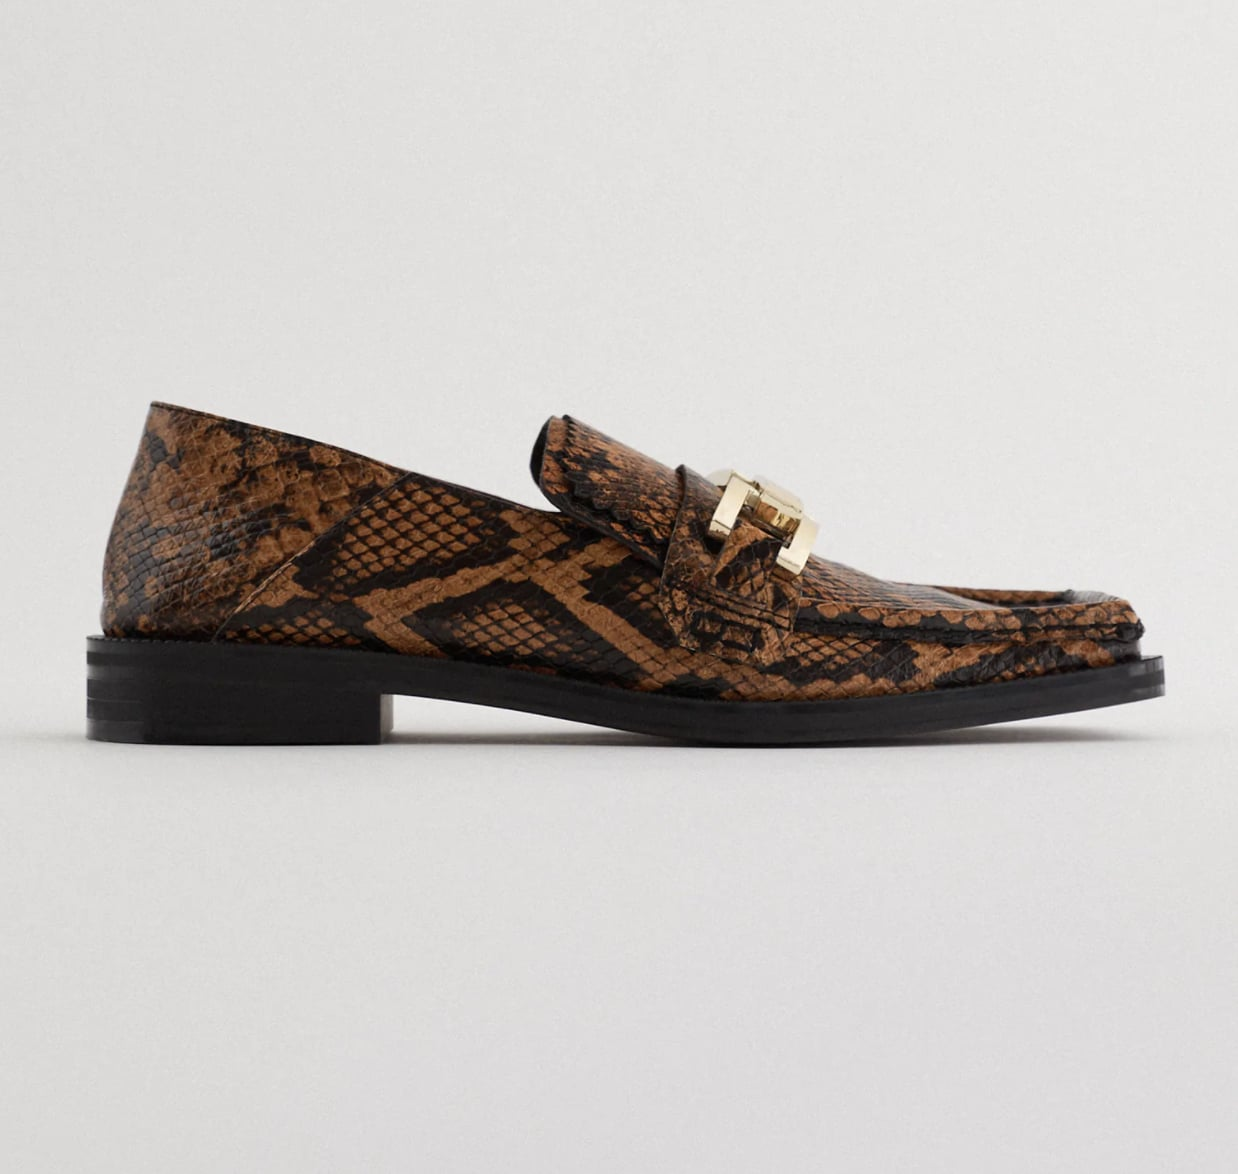 Zara Animal-Print Loafers | The 5